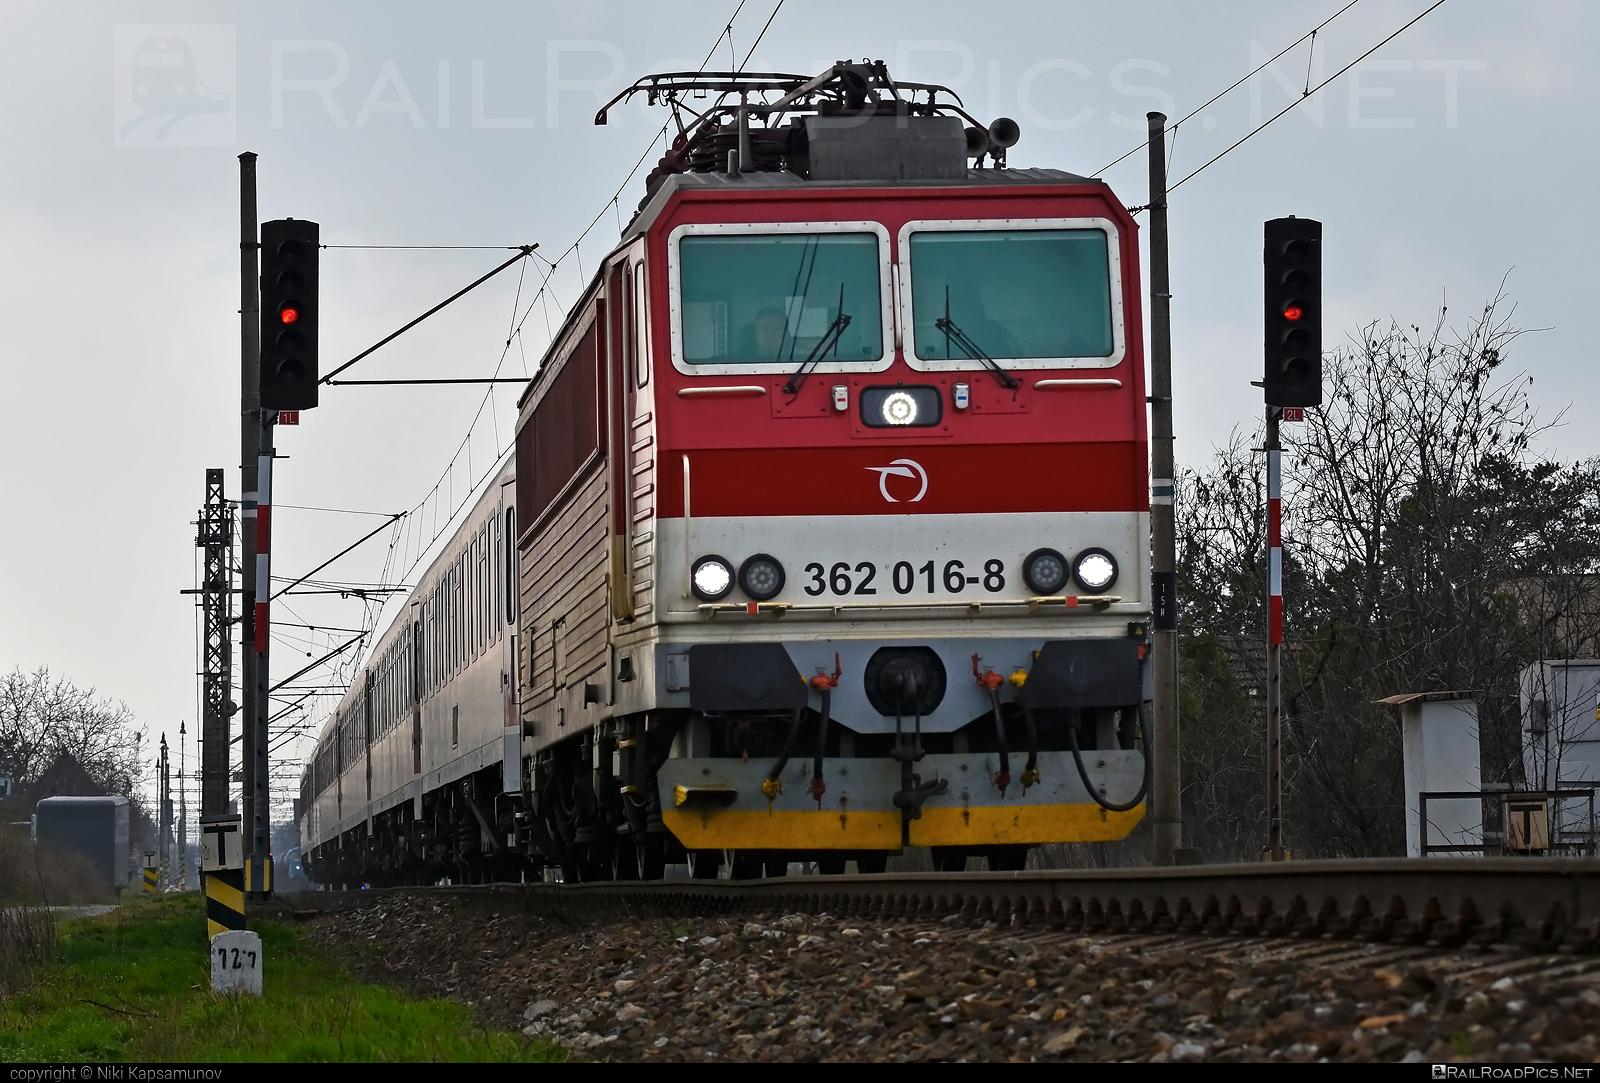 Škoda 69Er - 362 016-8 operated by Železničná Spoločnost' Slovensko, a.s. #ZeleznicnaSpolocnostSlovensko #eso #locomotive362 #rychleeso #skoda #skoda69er #zssk